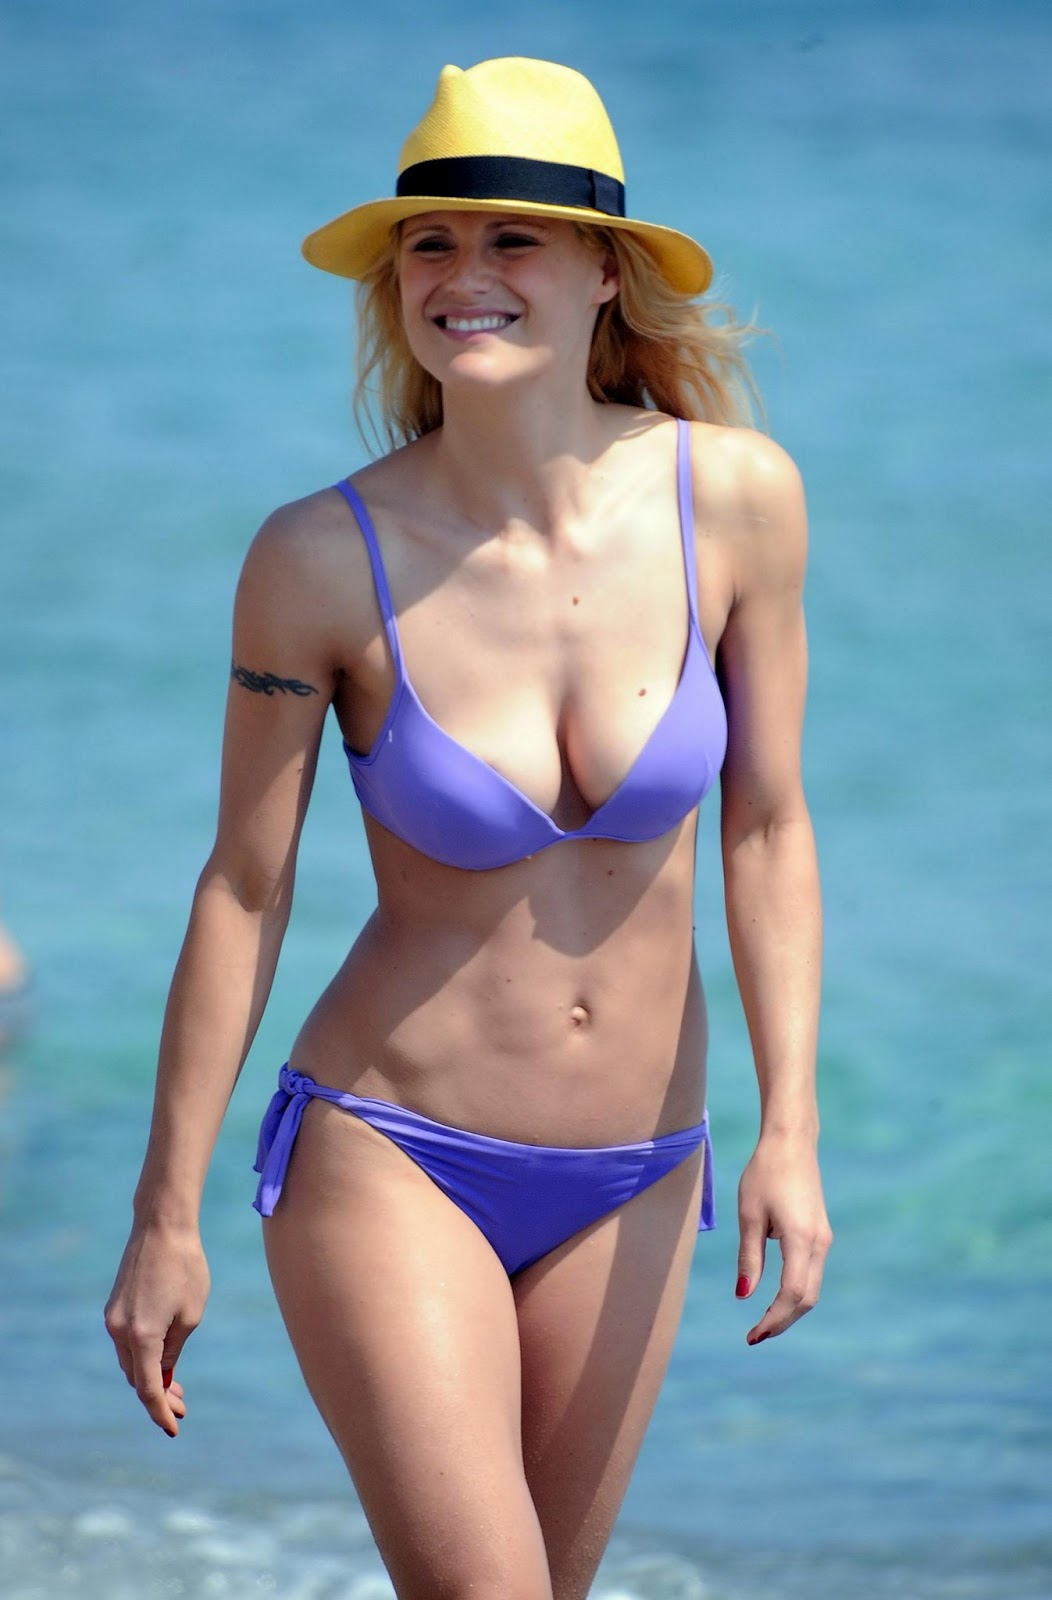 Michelle Hunziker bikini photoshoot in italy   Hot Bikini Babes